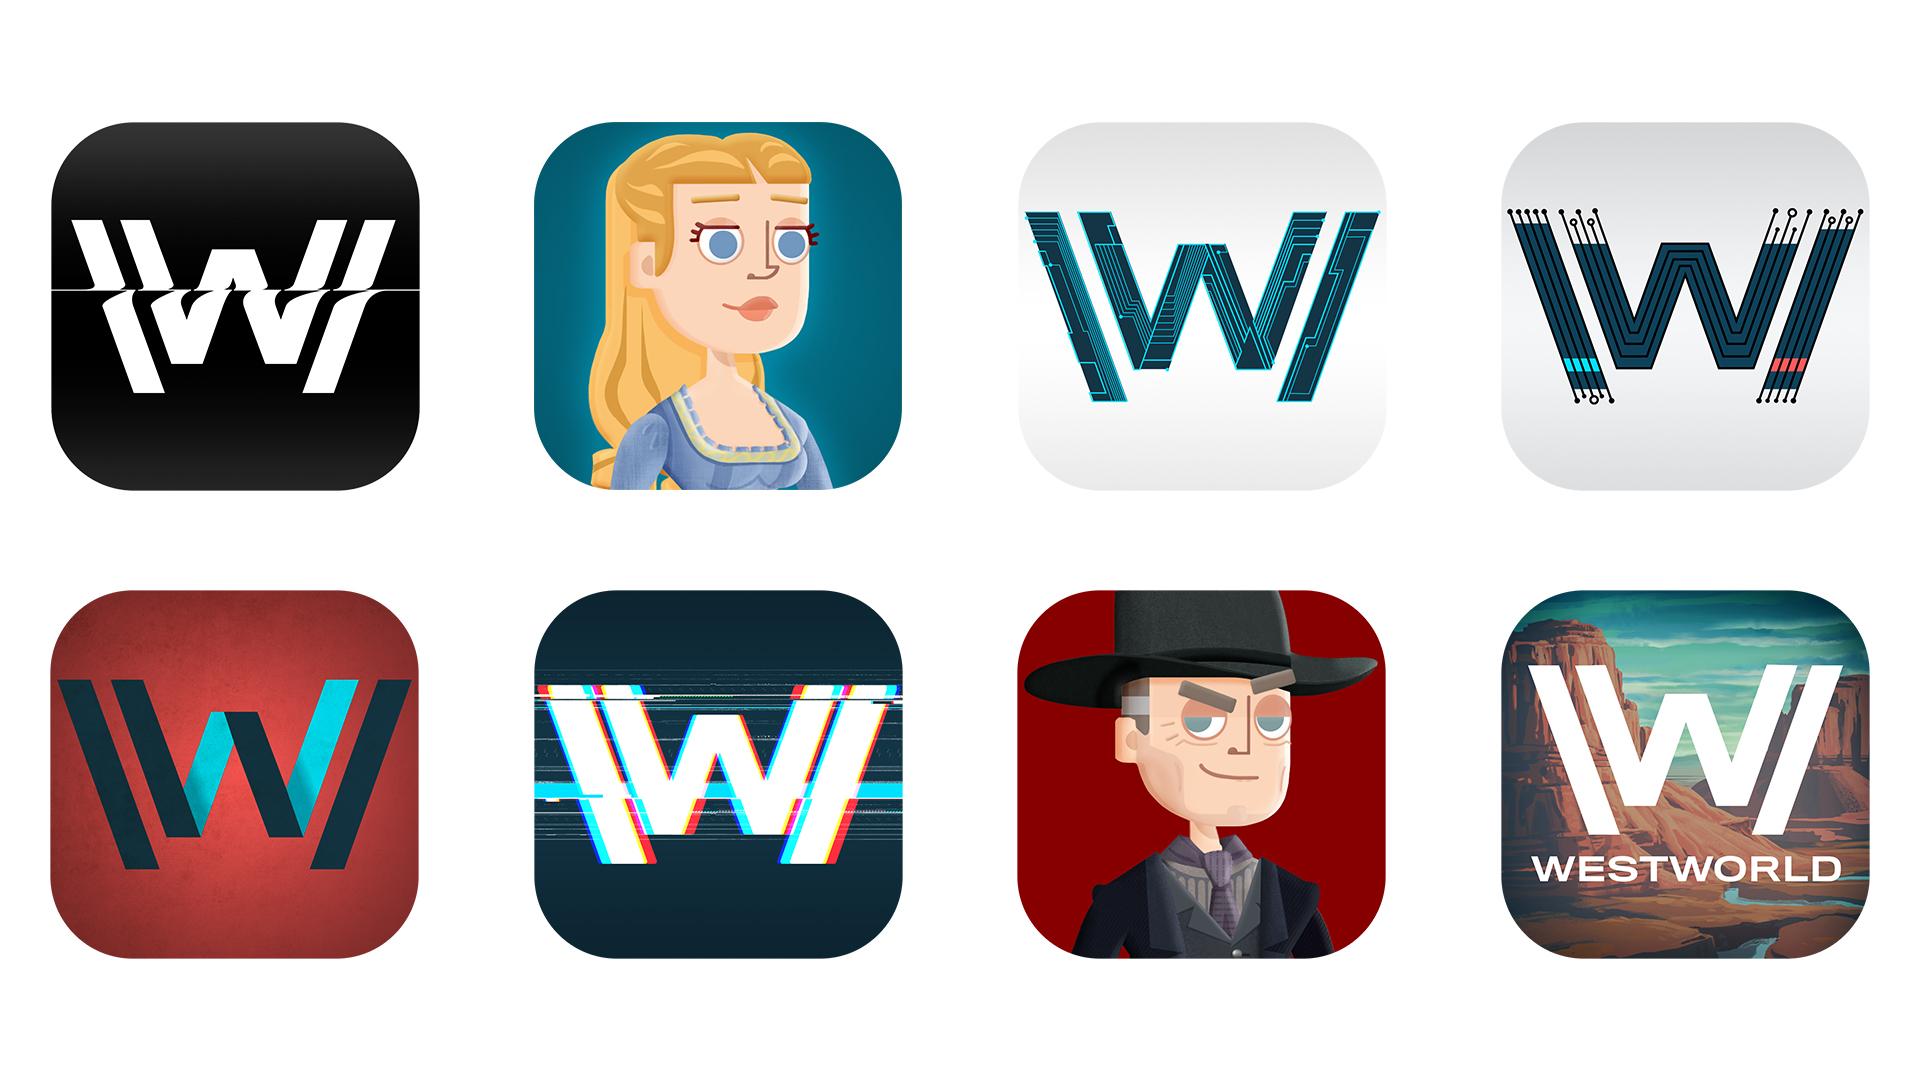 App icon exploration